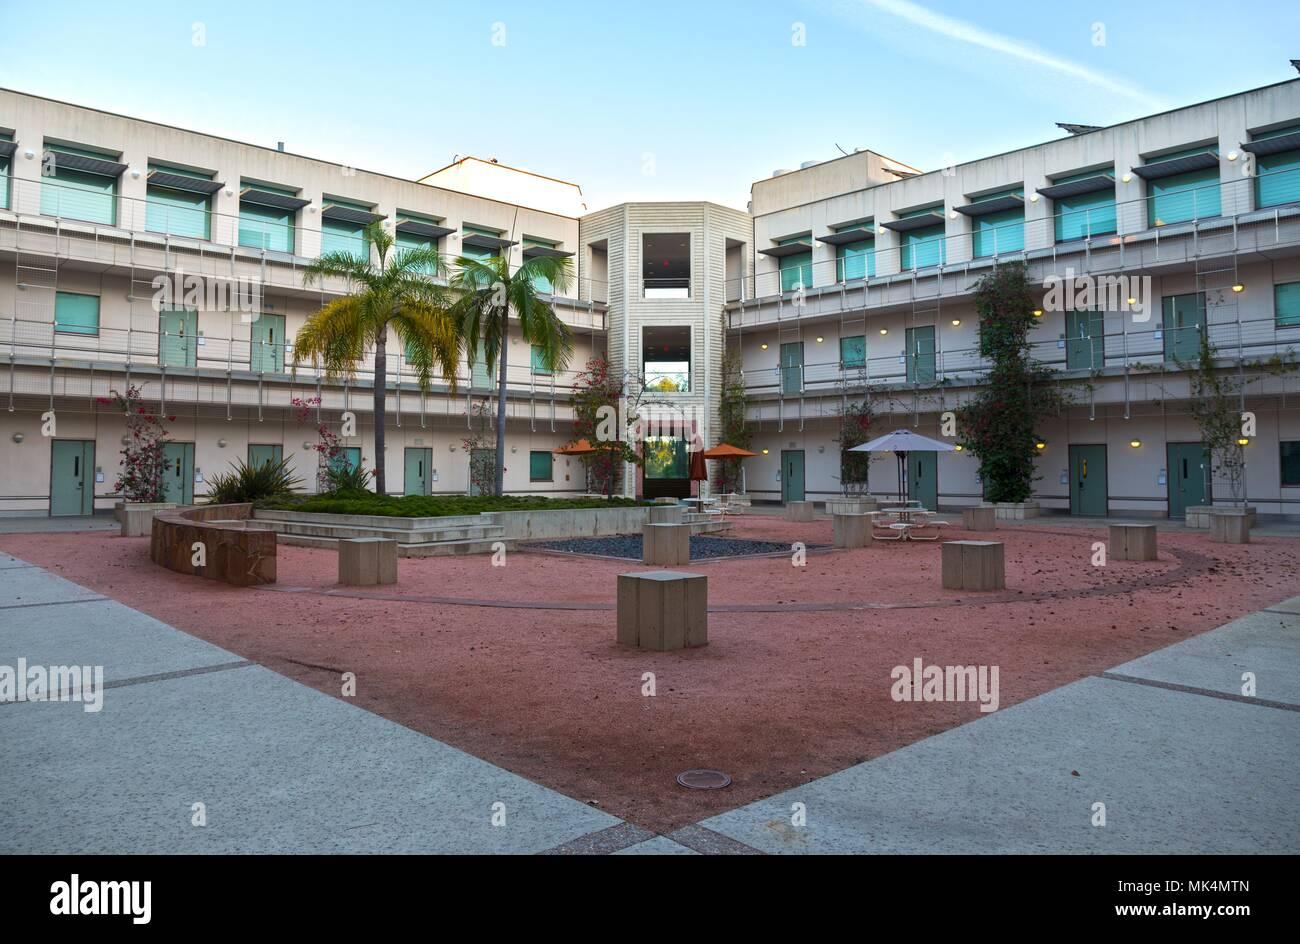 Courtyard inside Earl Warren Undergraduate College of Engineering on